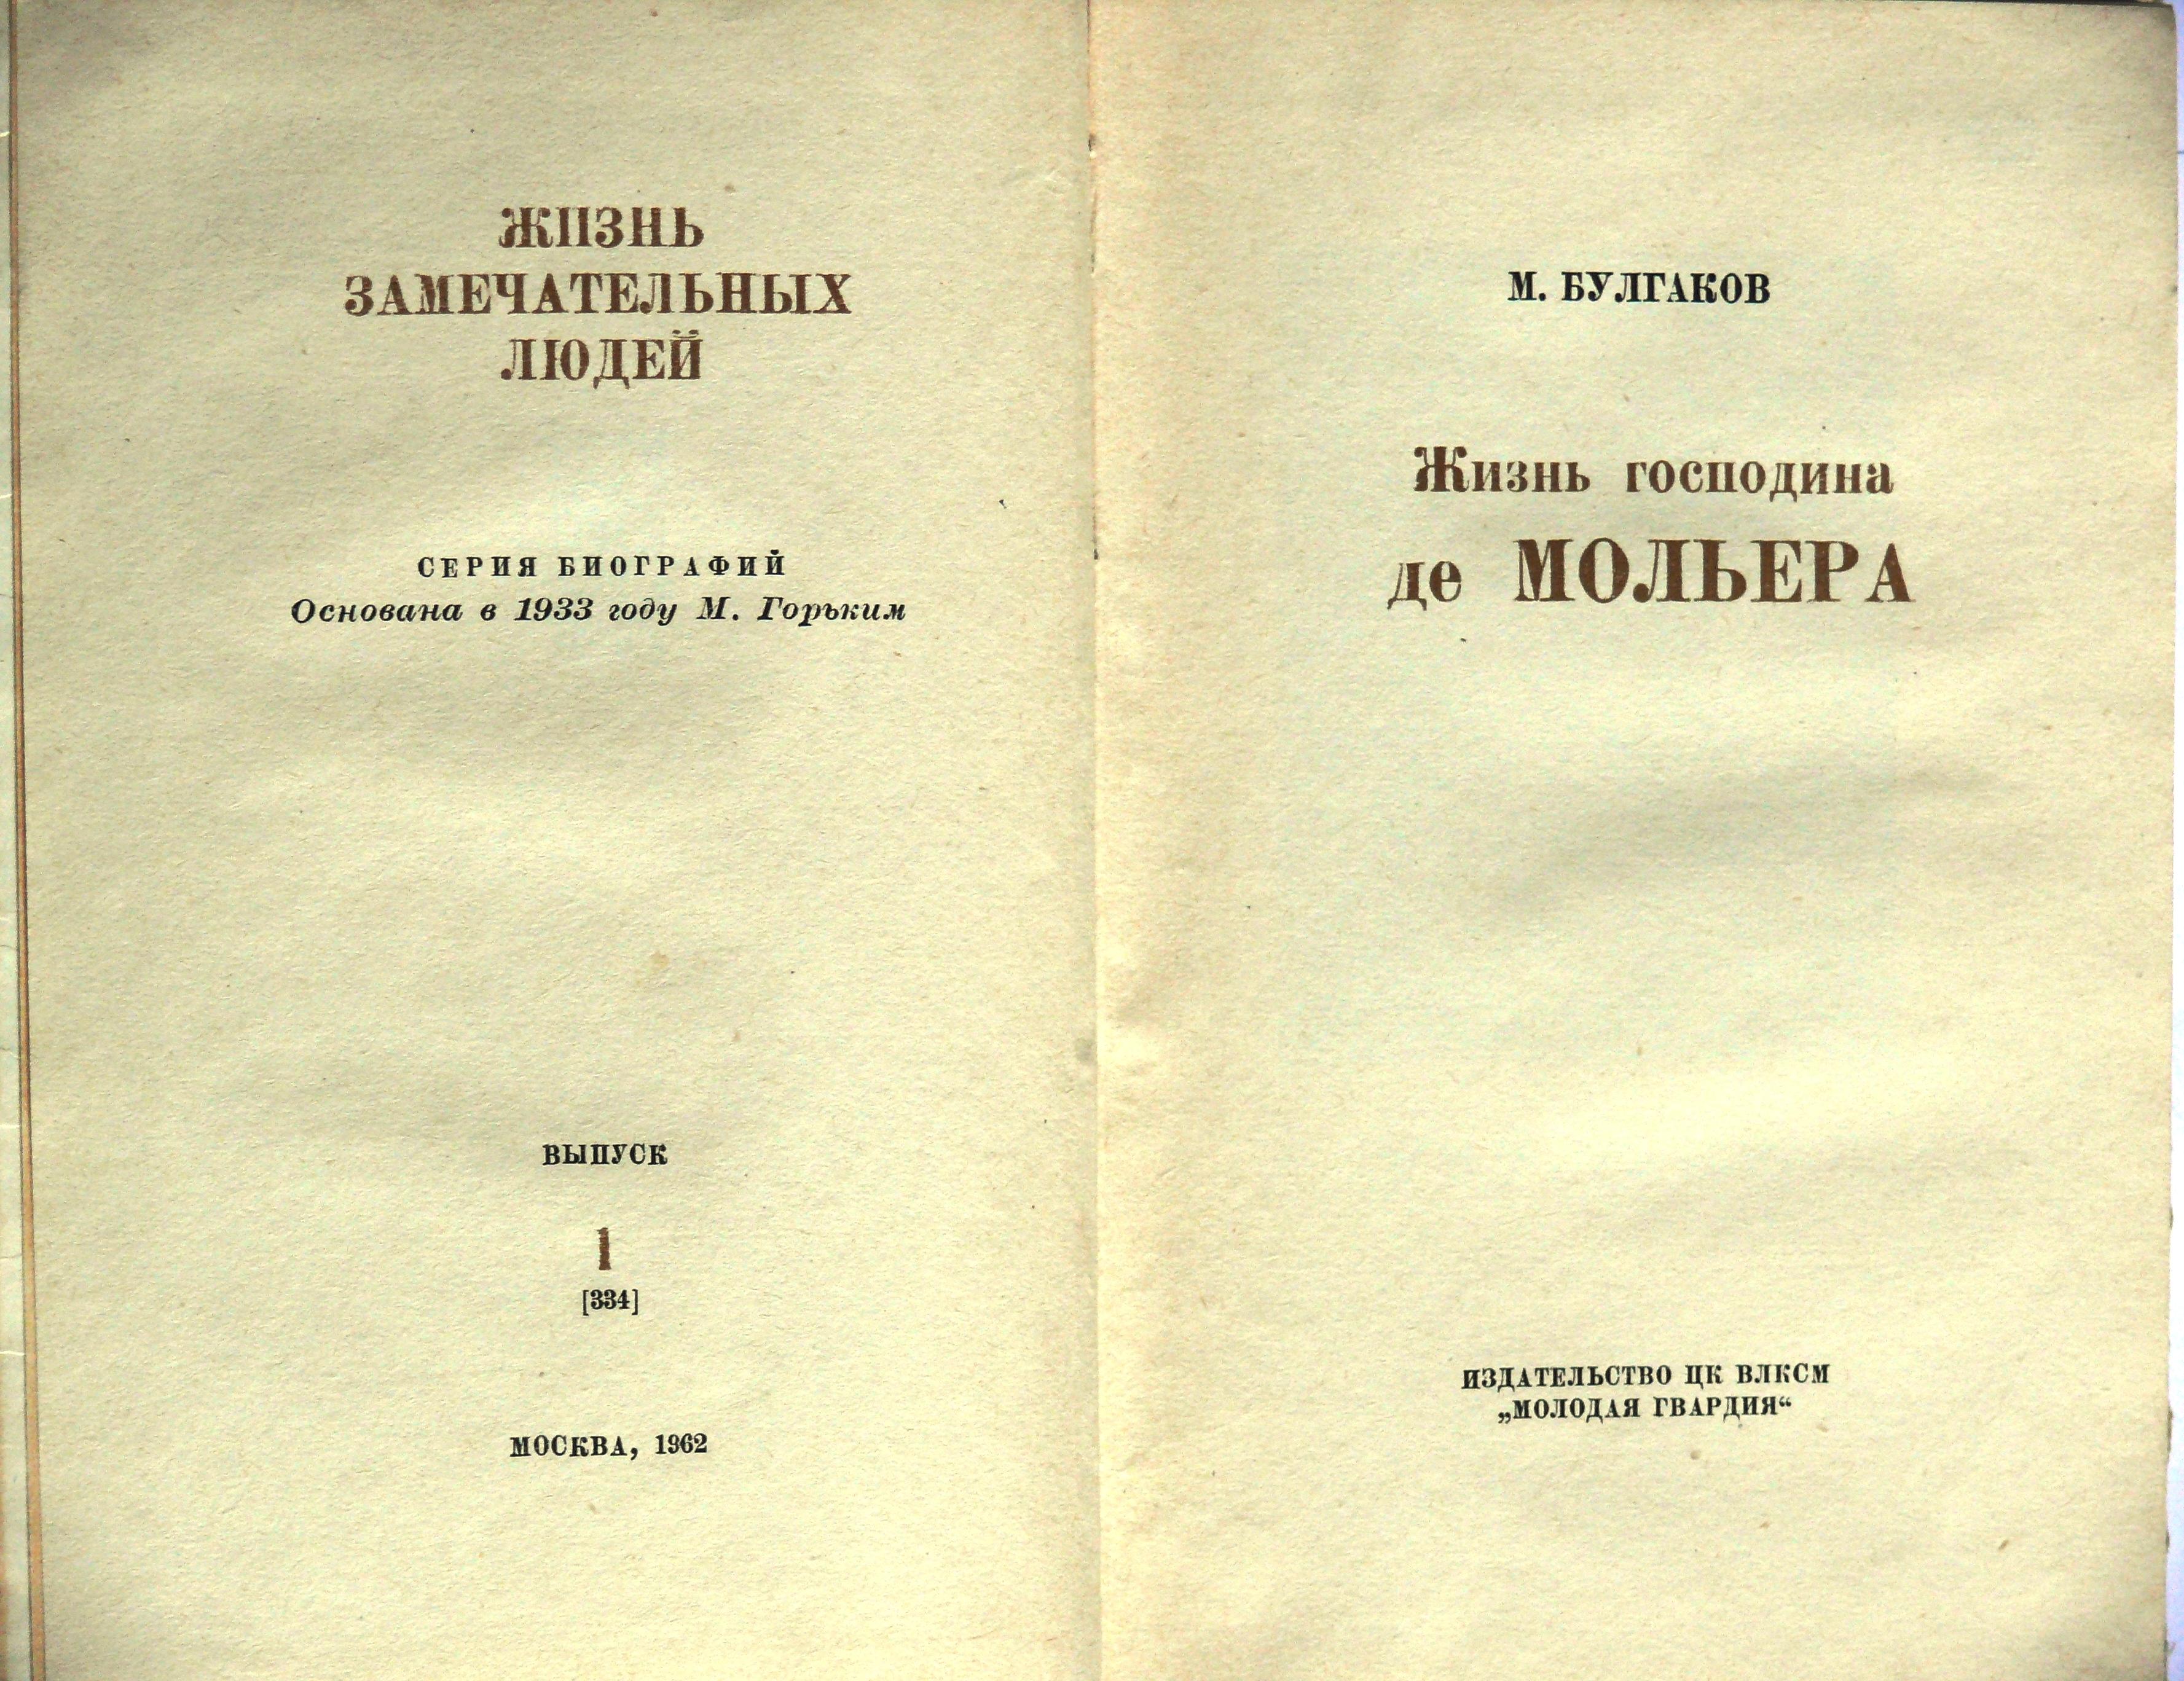 Bulgakov 1962 Title page.jpg